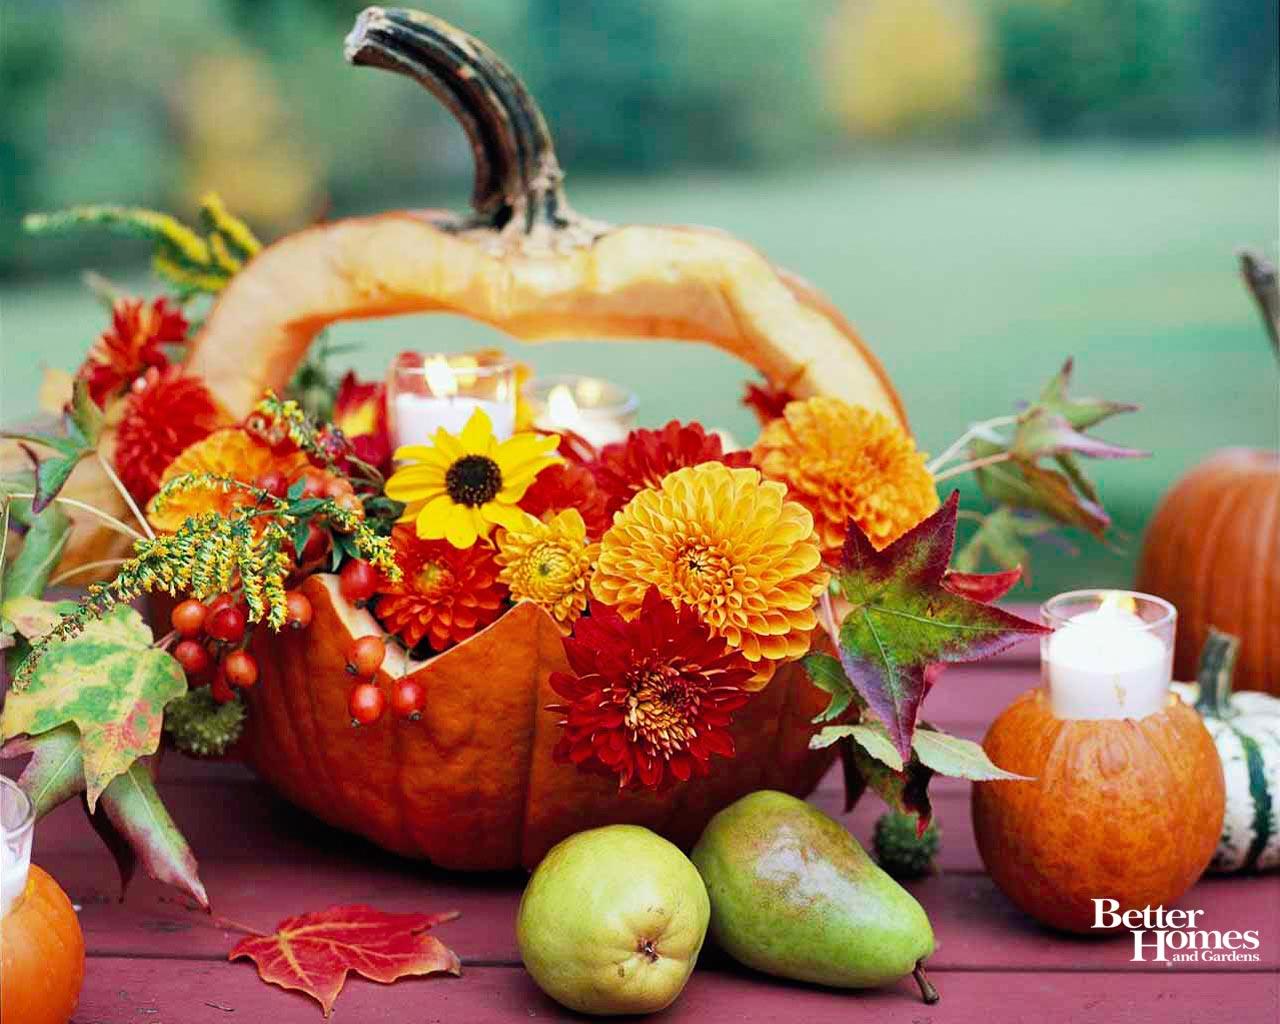 Fall Desktop Wallpapers With Pumpkins Best Hd Wallpapers 1280x1024